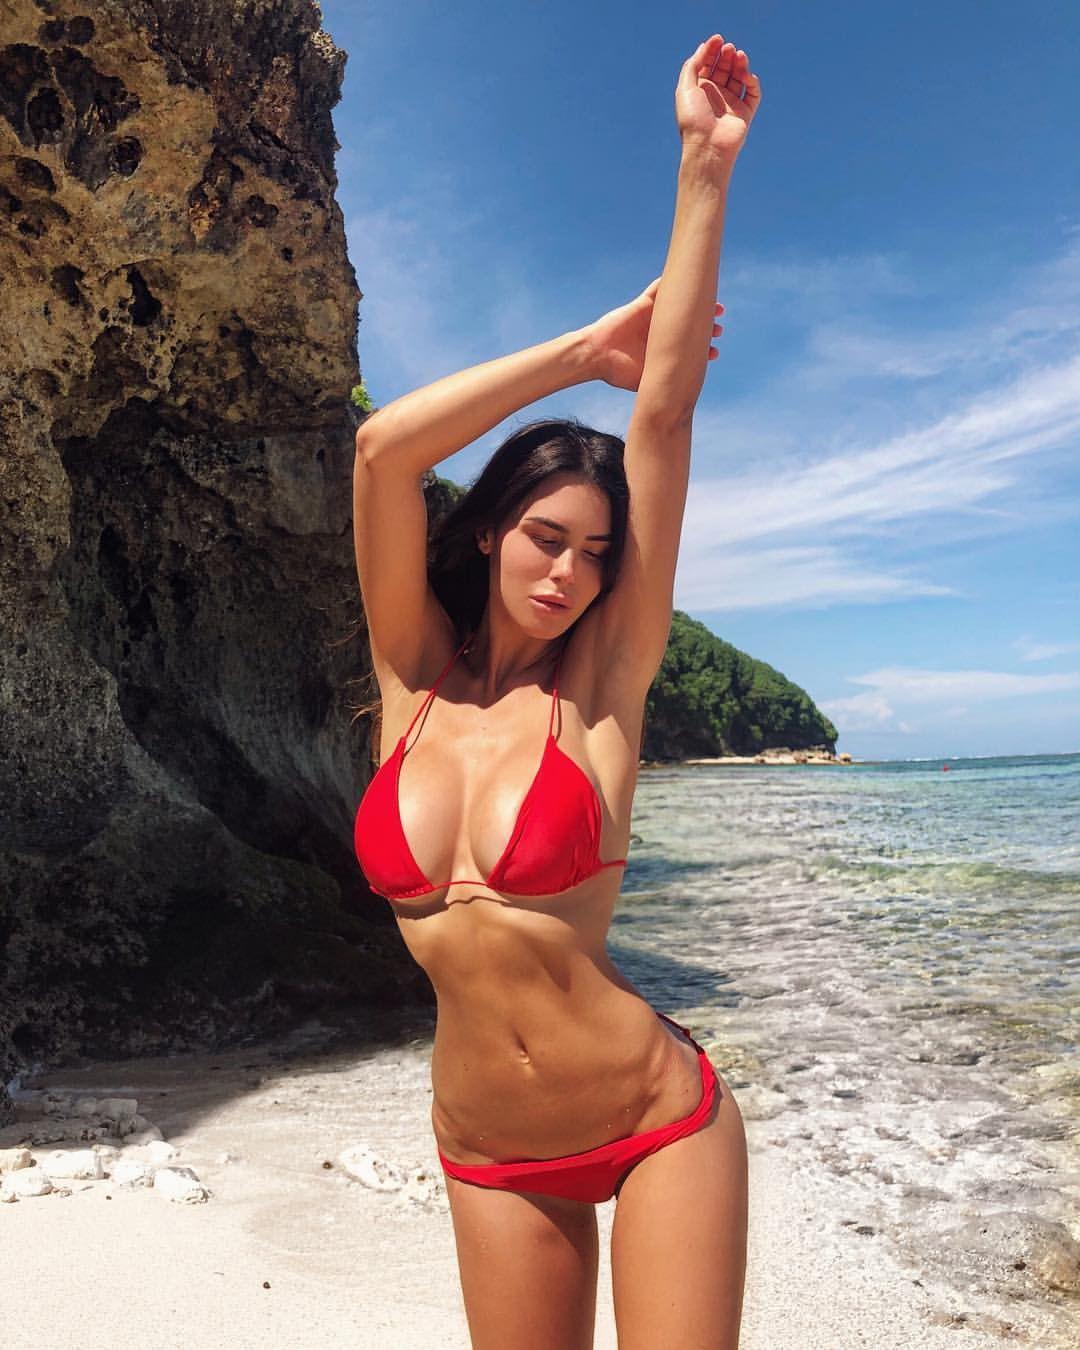 Is a cute Micaela Schafer feat. RoxxyX nude photos 2019